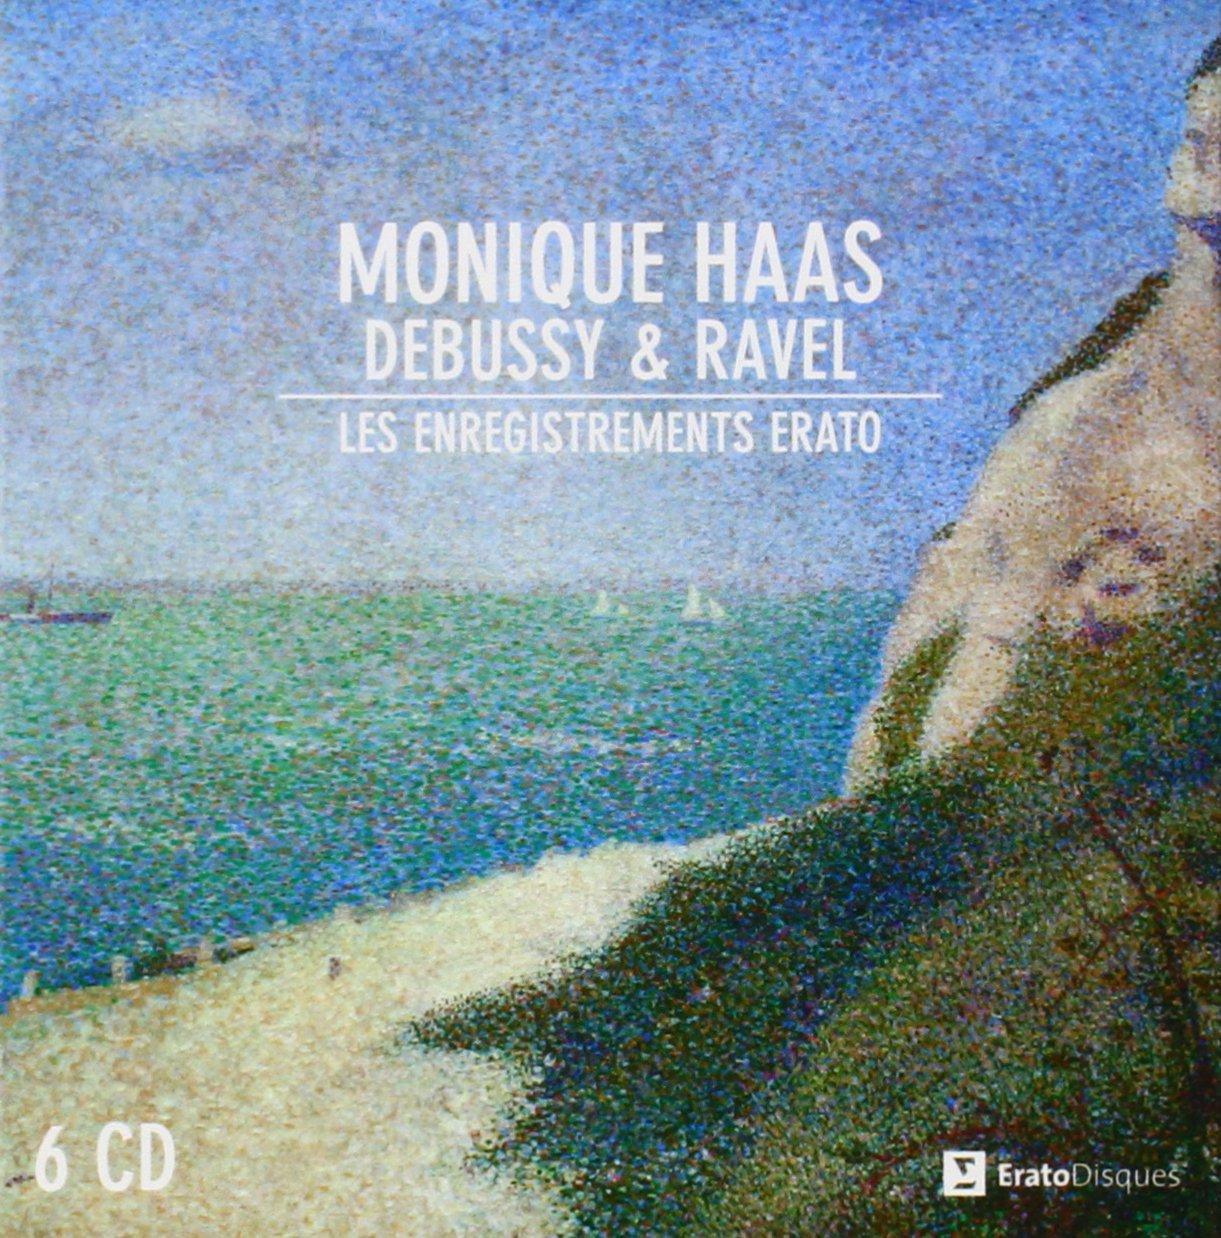 Debussy / Ravel: Les Enregistrements Erato